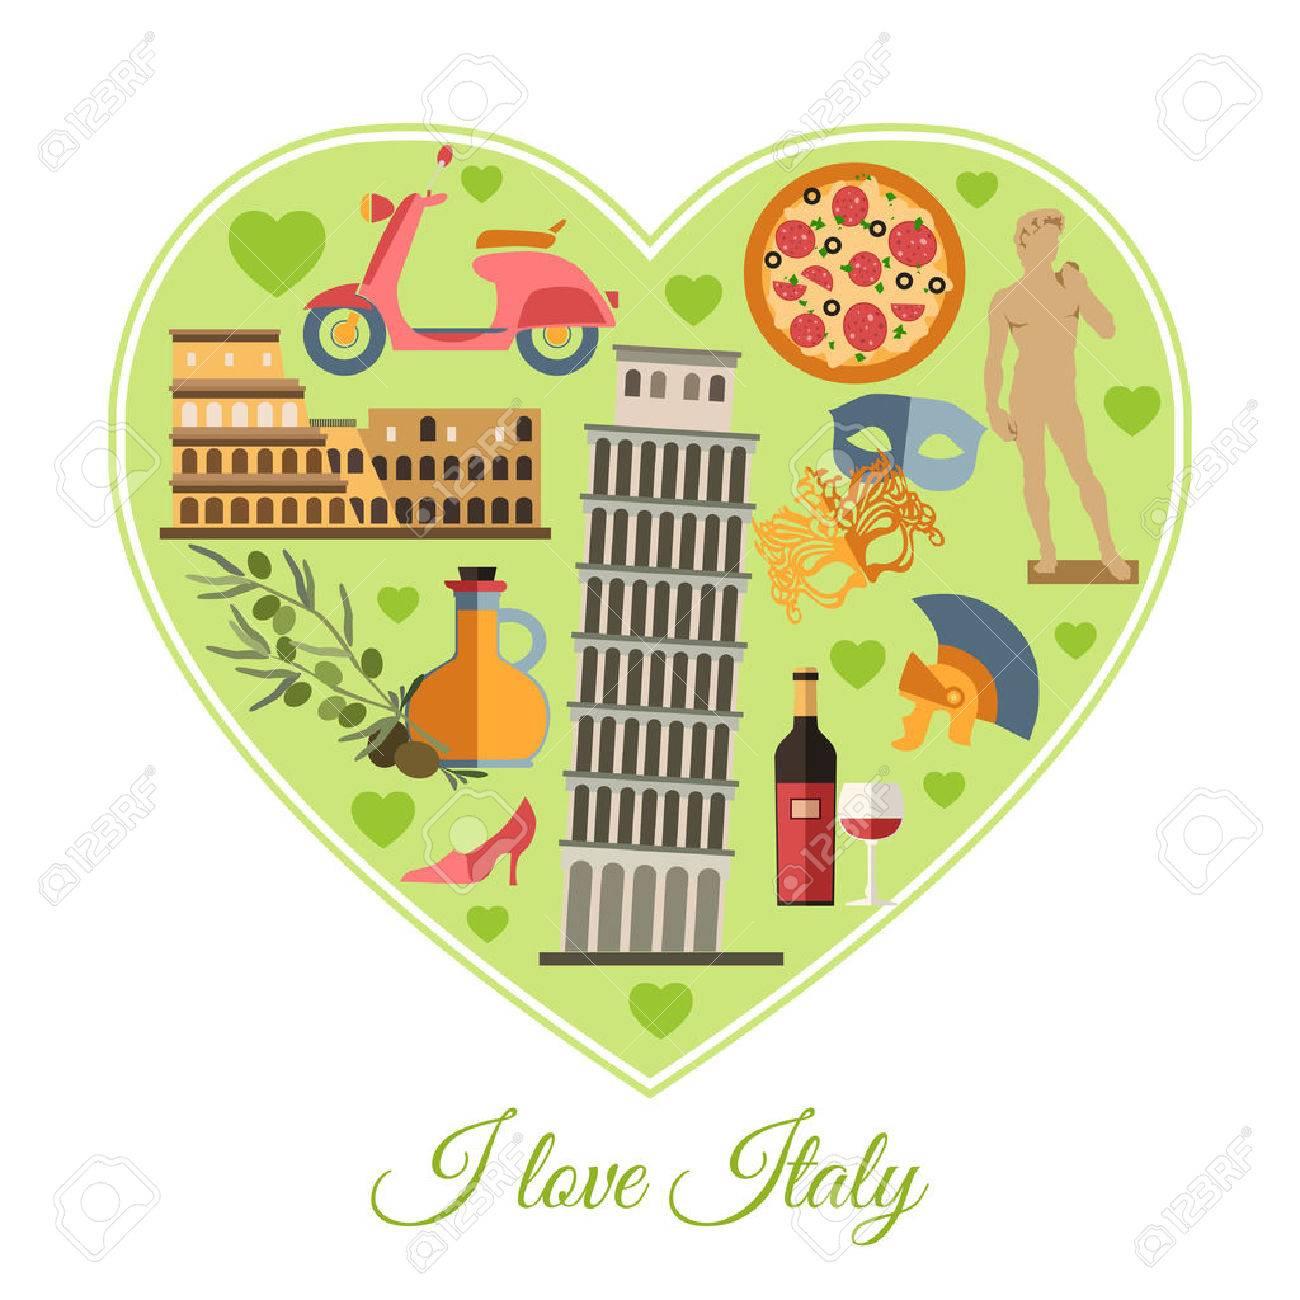 266,082 Heart Shape Cliparts, Stock Vector And Royalty Free Heart ...